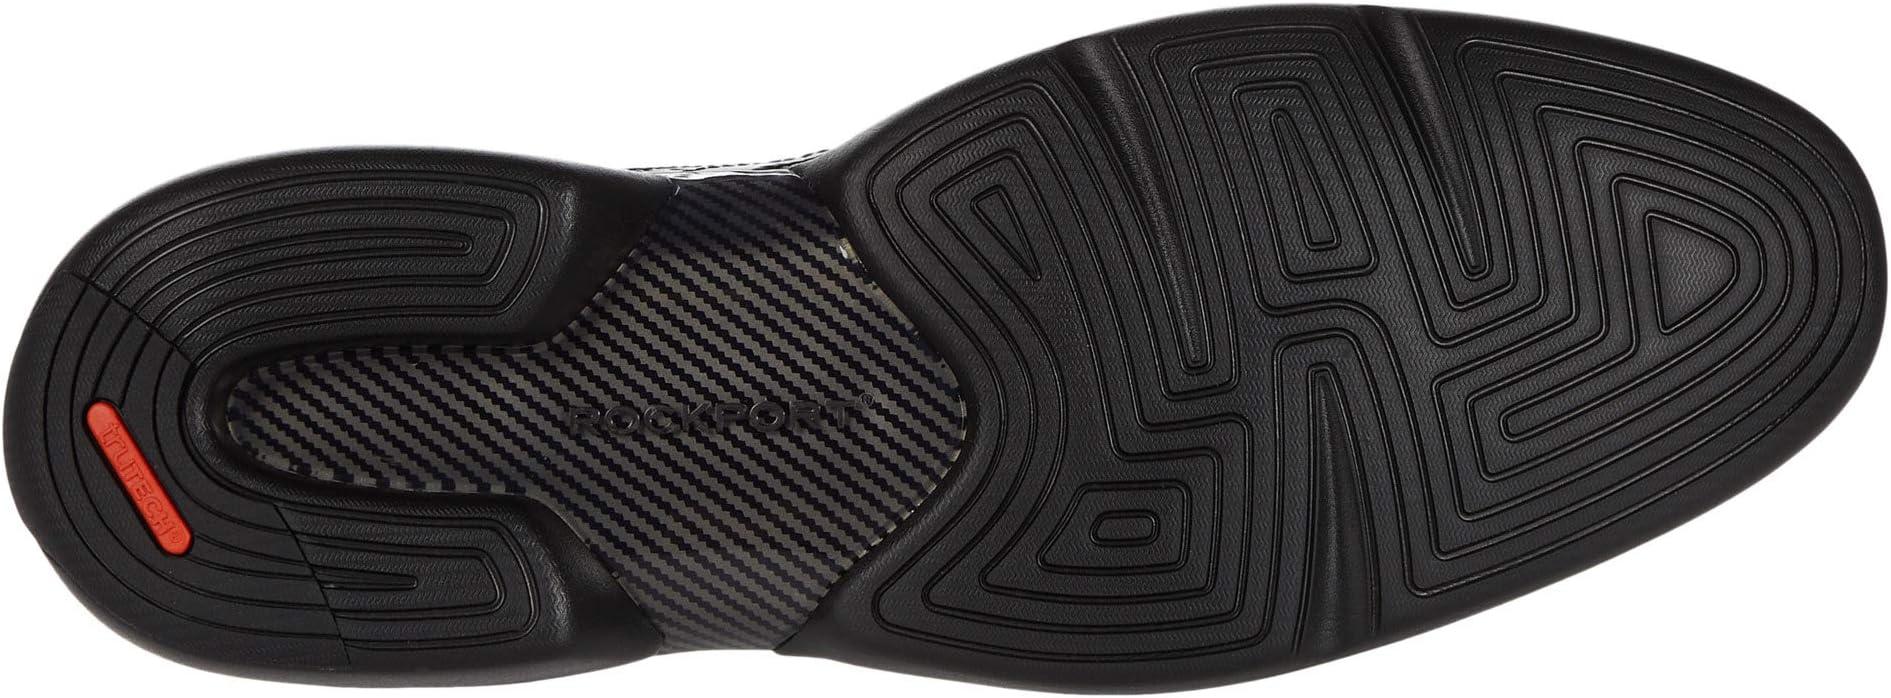 Rockport Total Motion Advance Wing Tip   Men's shoes   2020 Newest